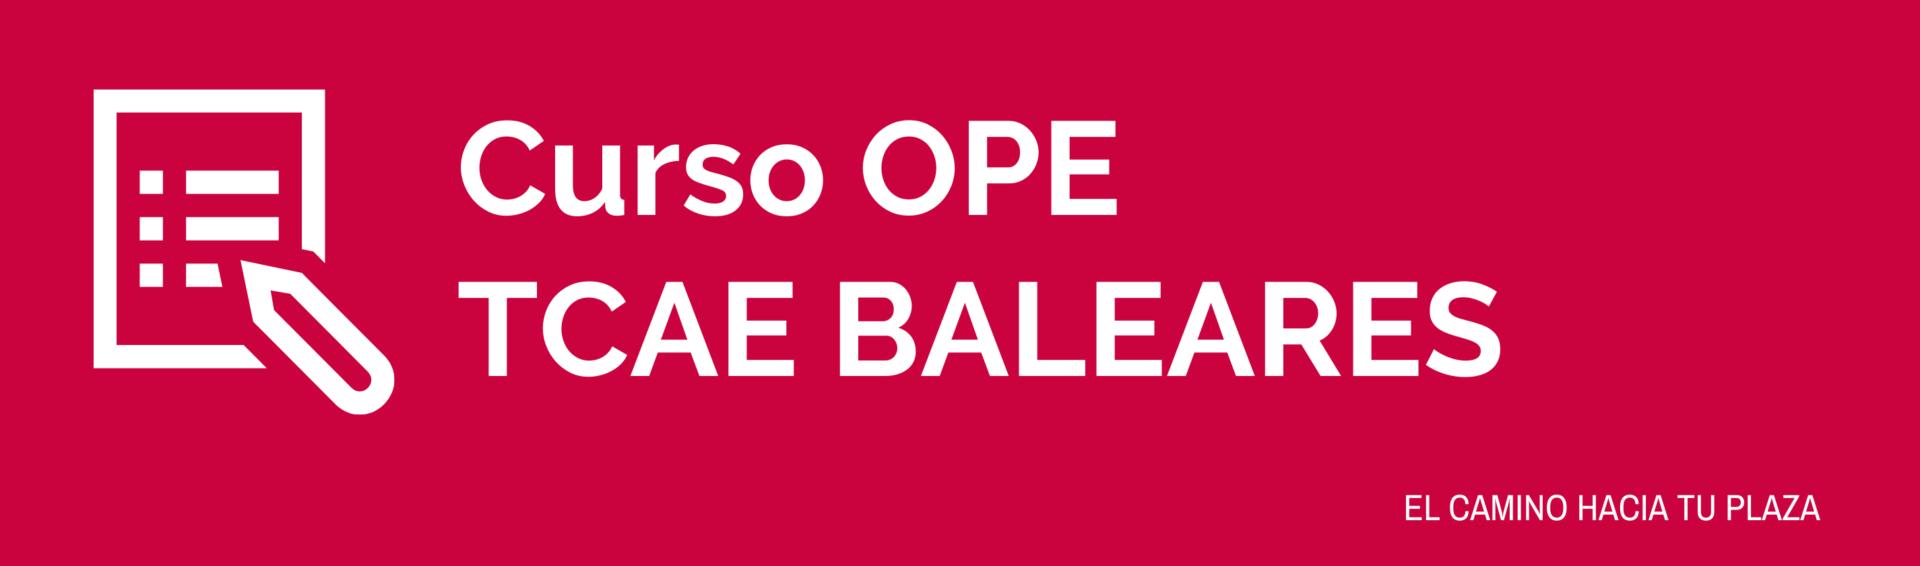 Cabecera curso OPE TCAE Baleares